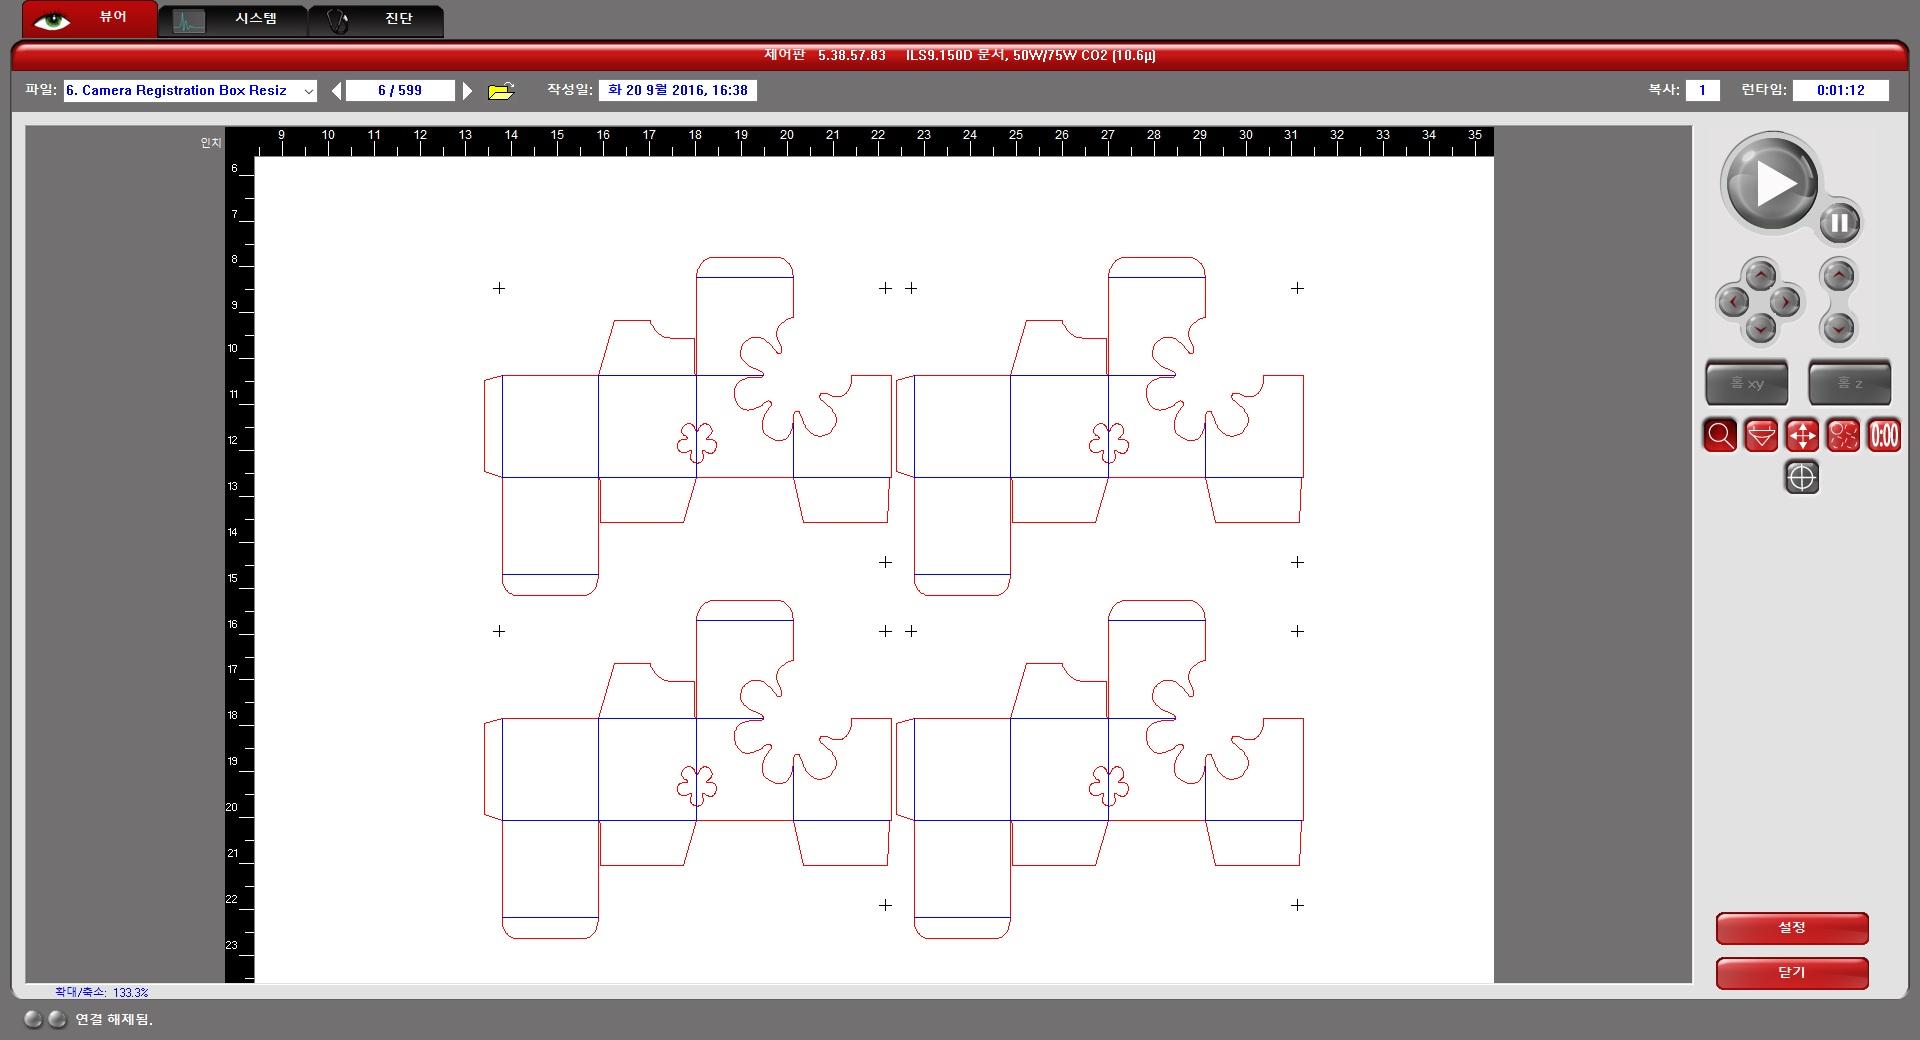 XLS 시스템에 나타난 대로 중복으로 단일 카메라 등록 공정의 복사본 4개가 생성된 레이저 시스템 소프트웨어